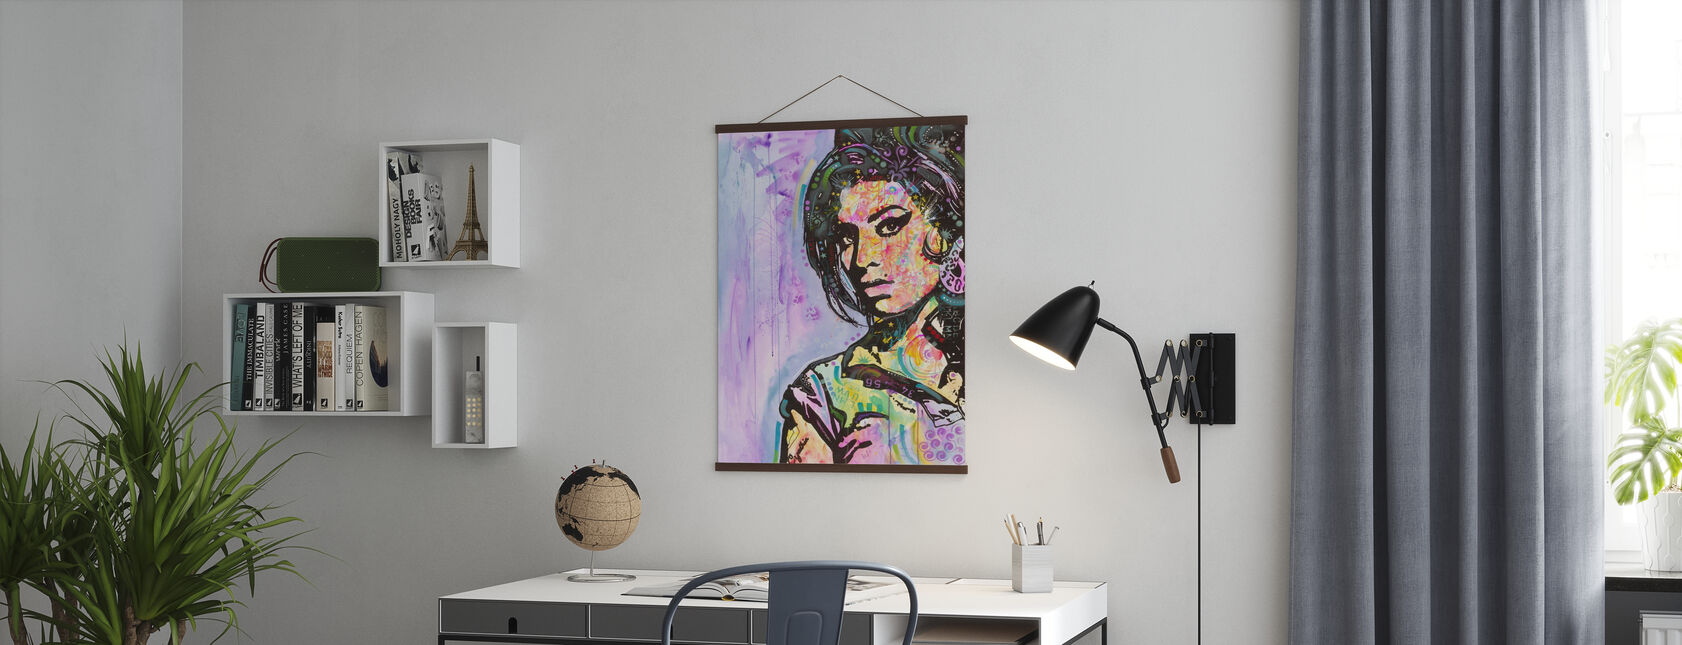 Amy - Plakat - Kontor